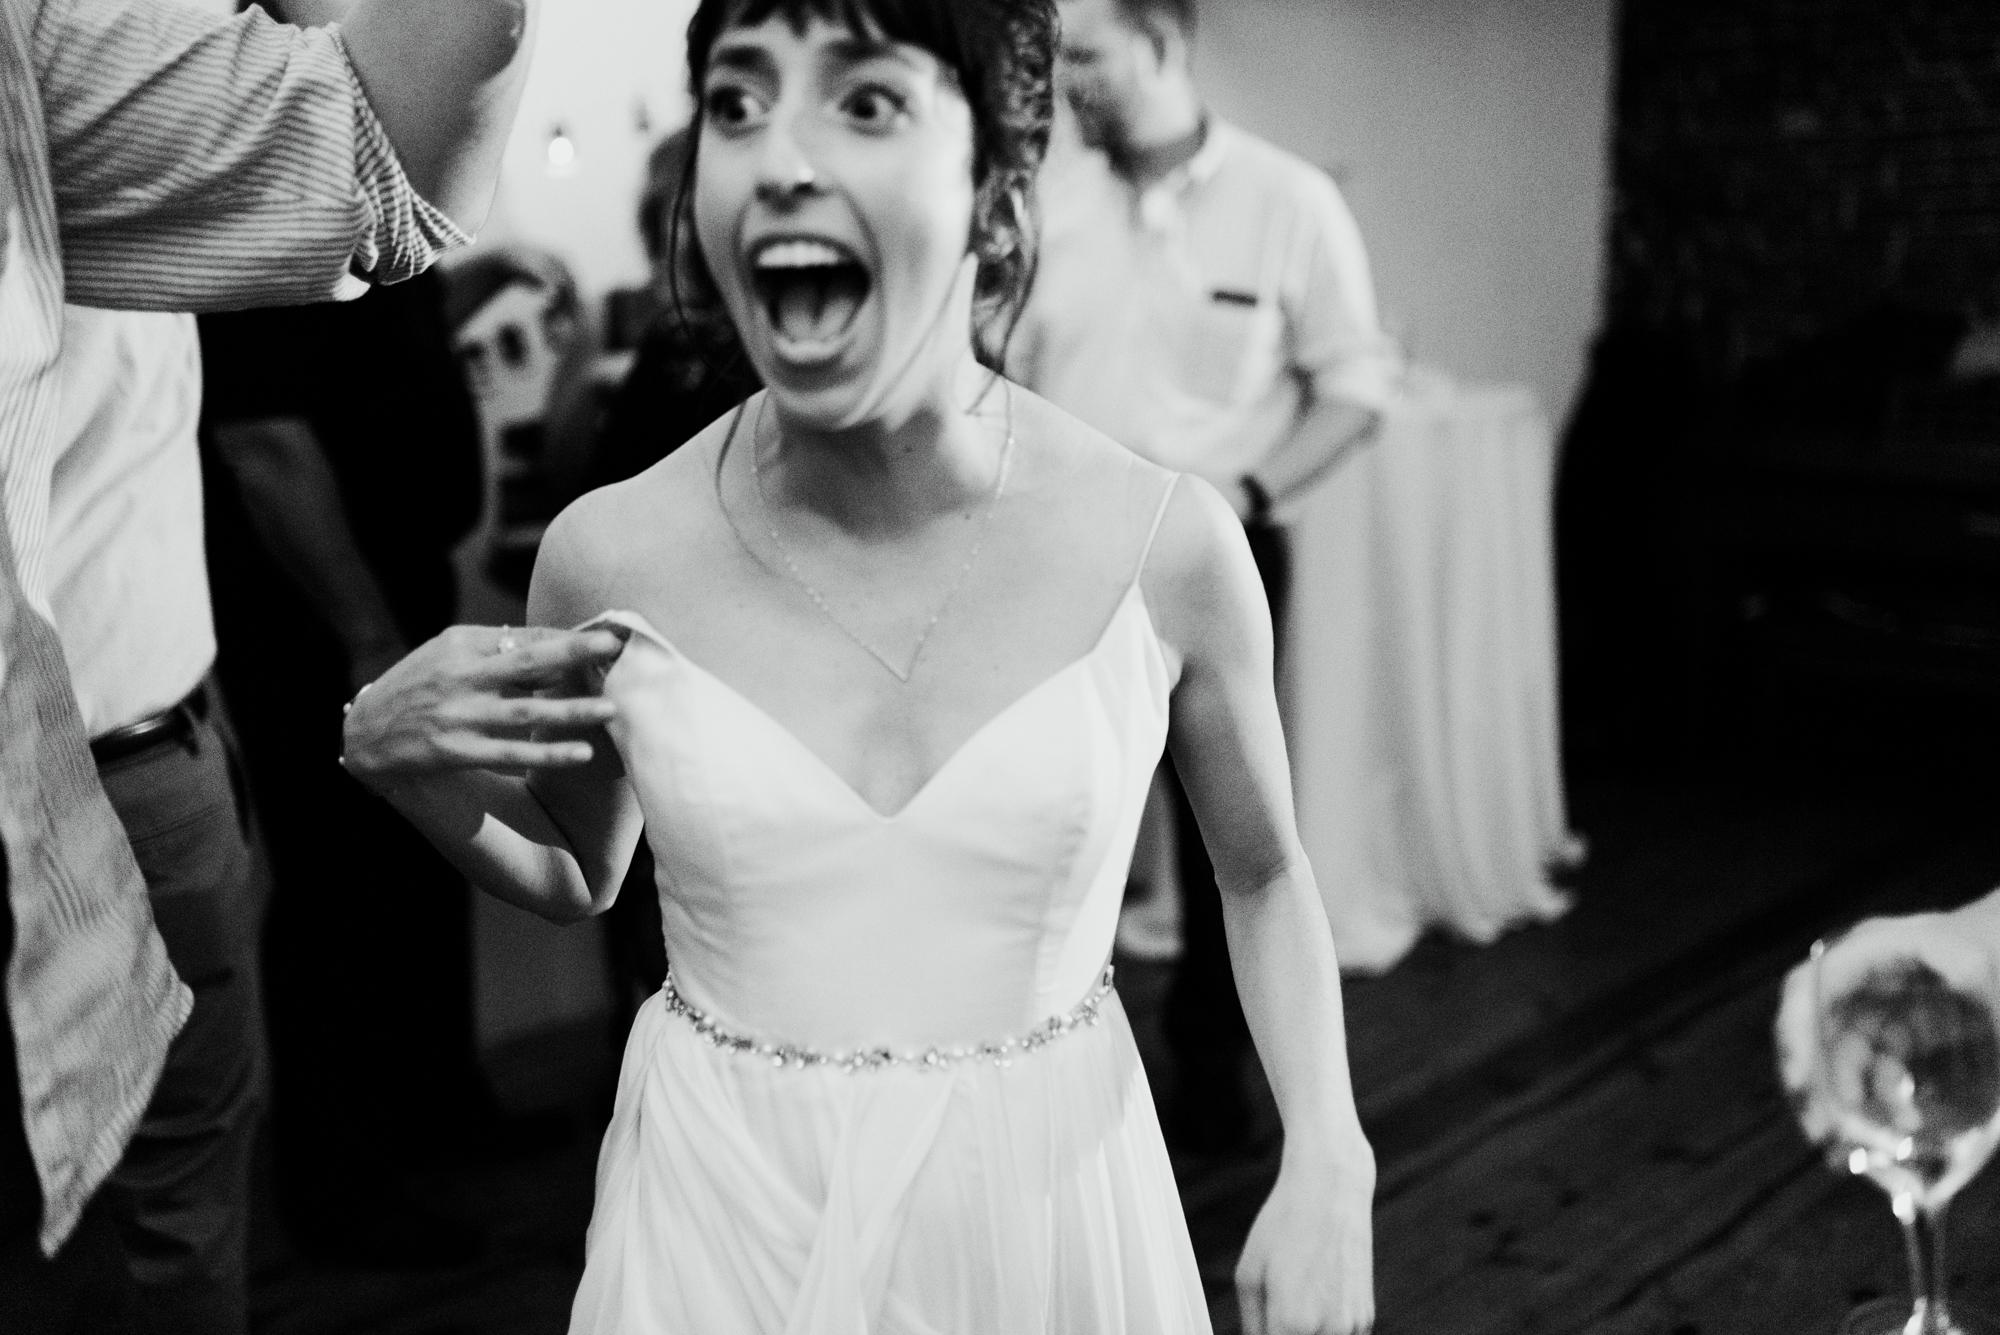 haley-richter-photography-maas-building-summer-wedding-philadelphia-DIY-birchtree-268.jpg